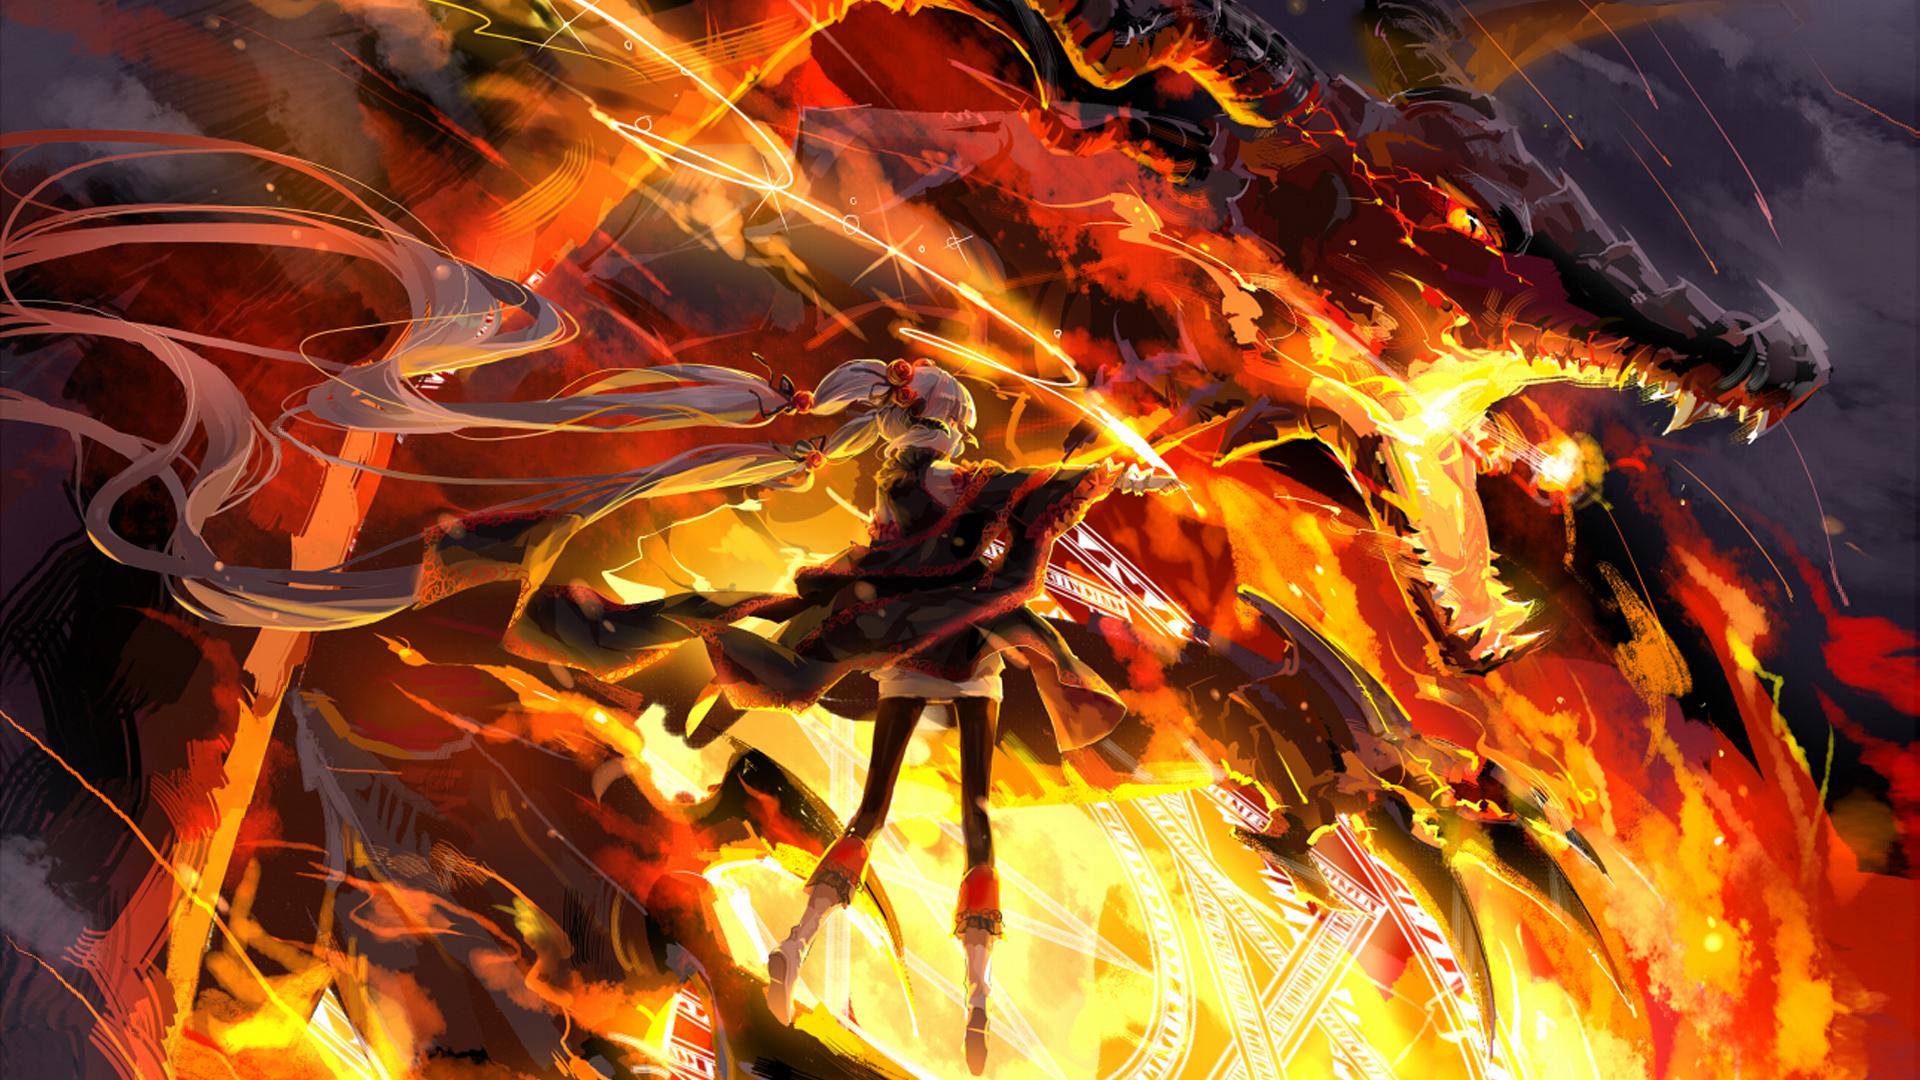 Cool Fire Dragon Wallpaper Fire dragon photos 1920x1080